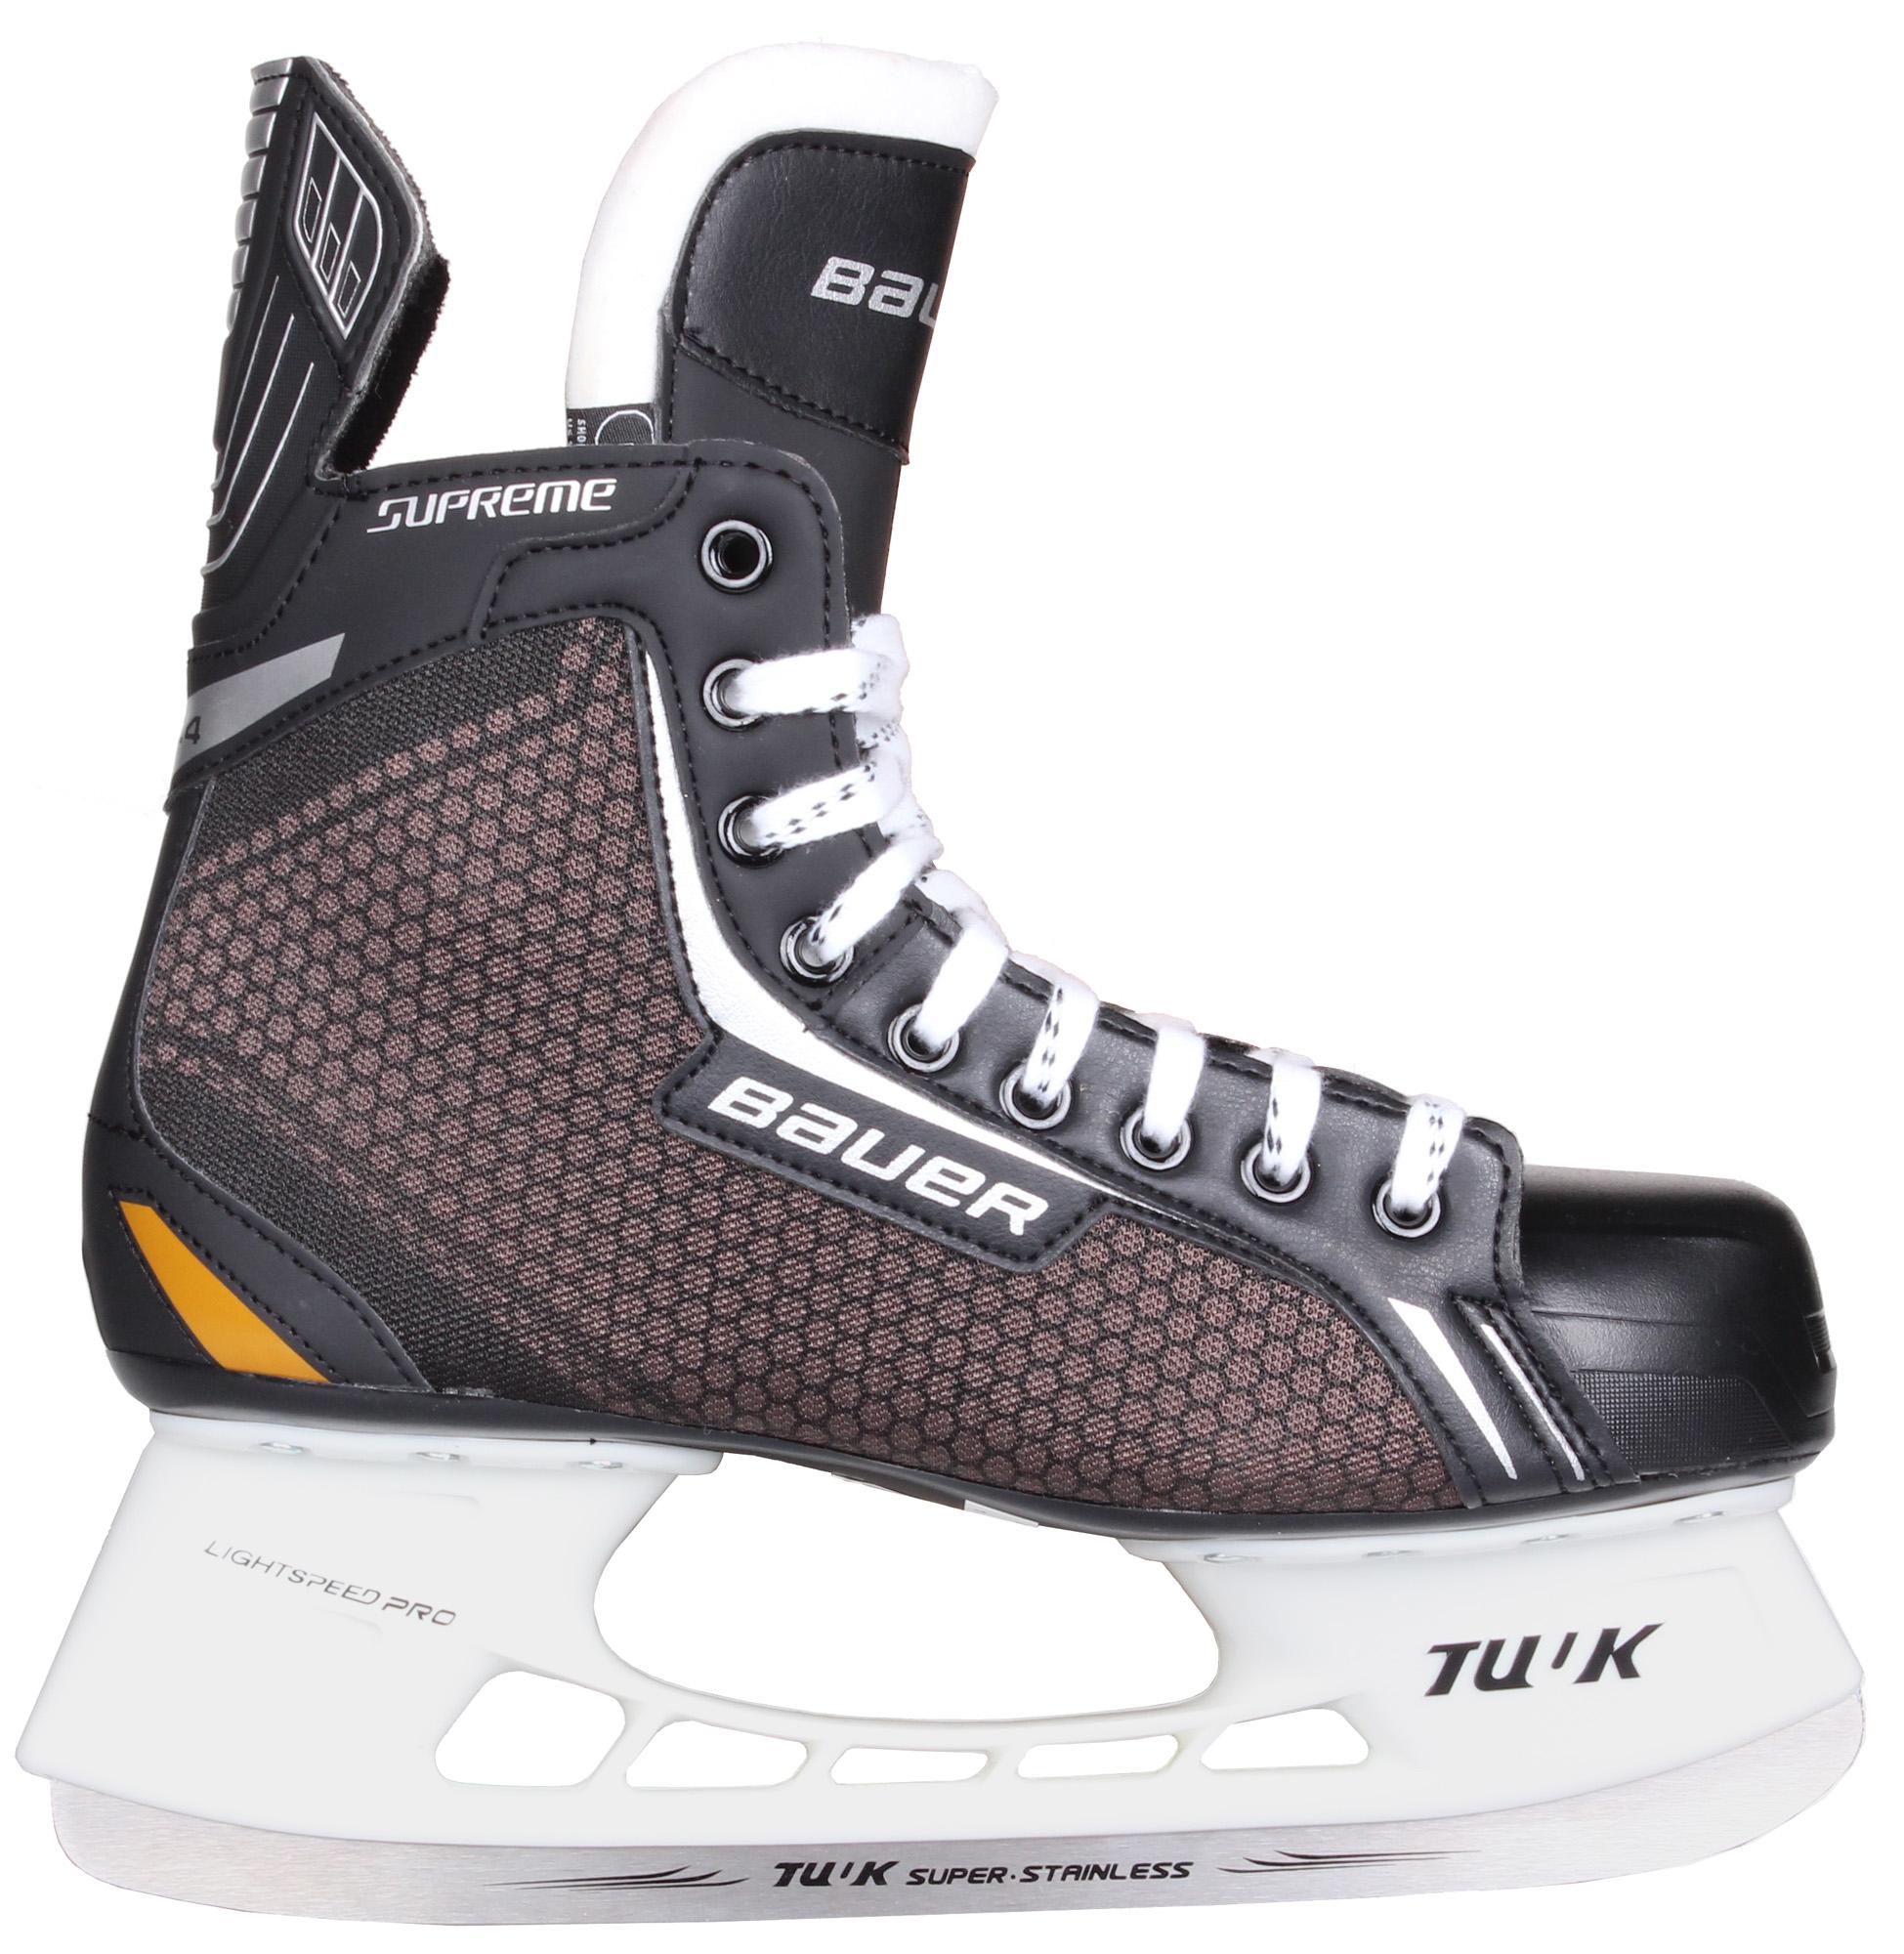 BAUER Supreme One.4 SR hokejové brusle, šíře R